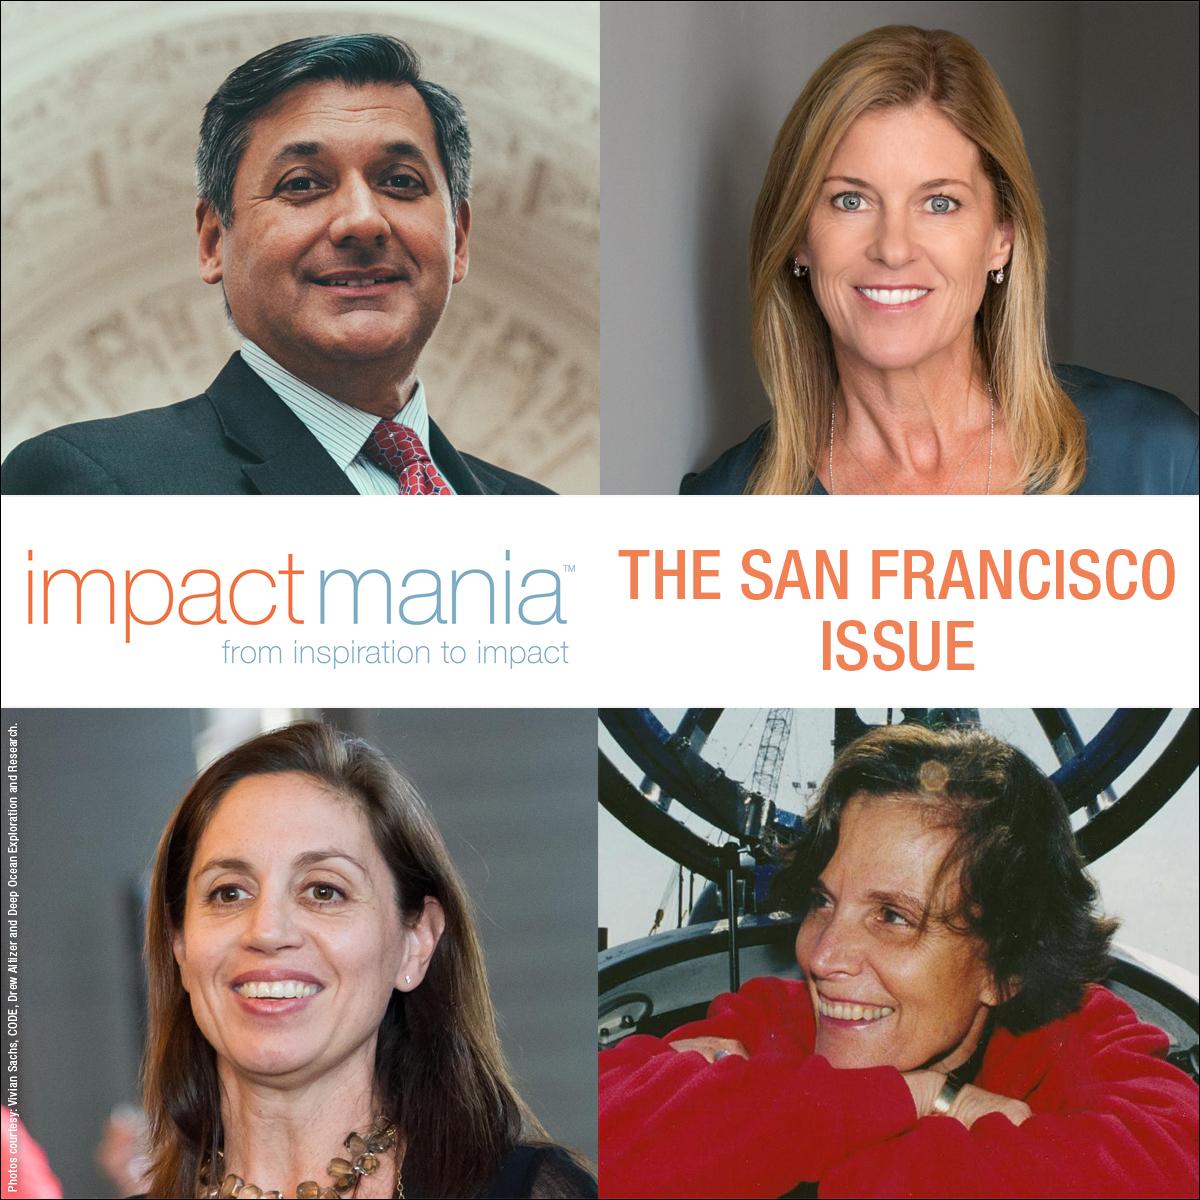 impactmania is in San Francisco!